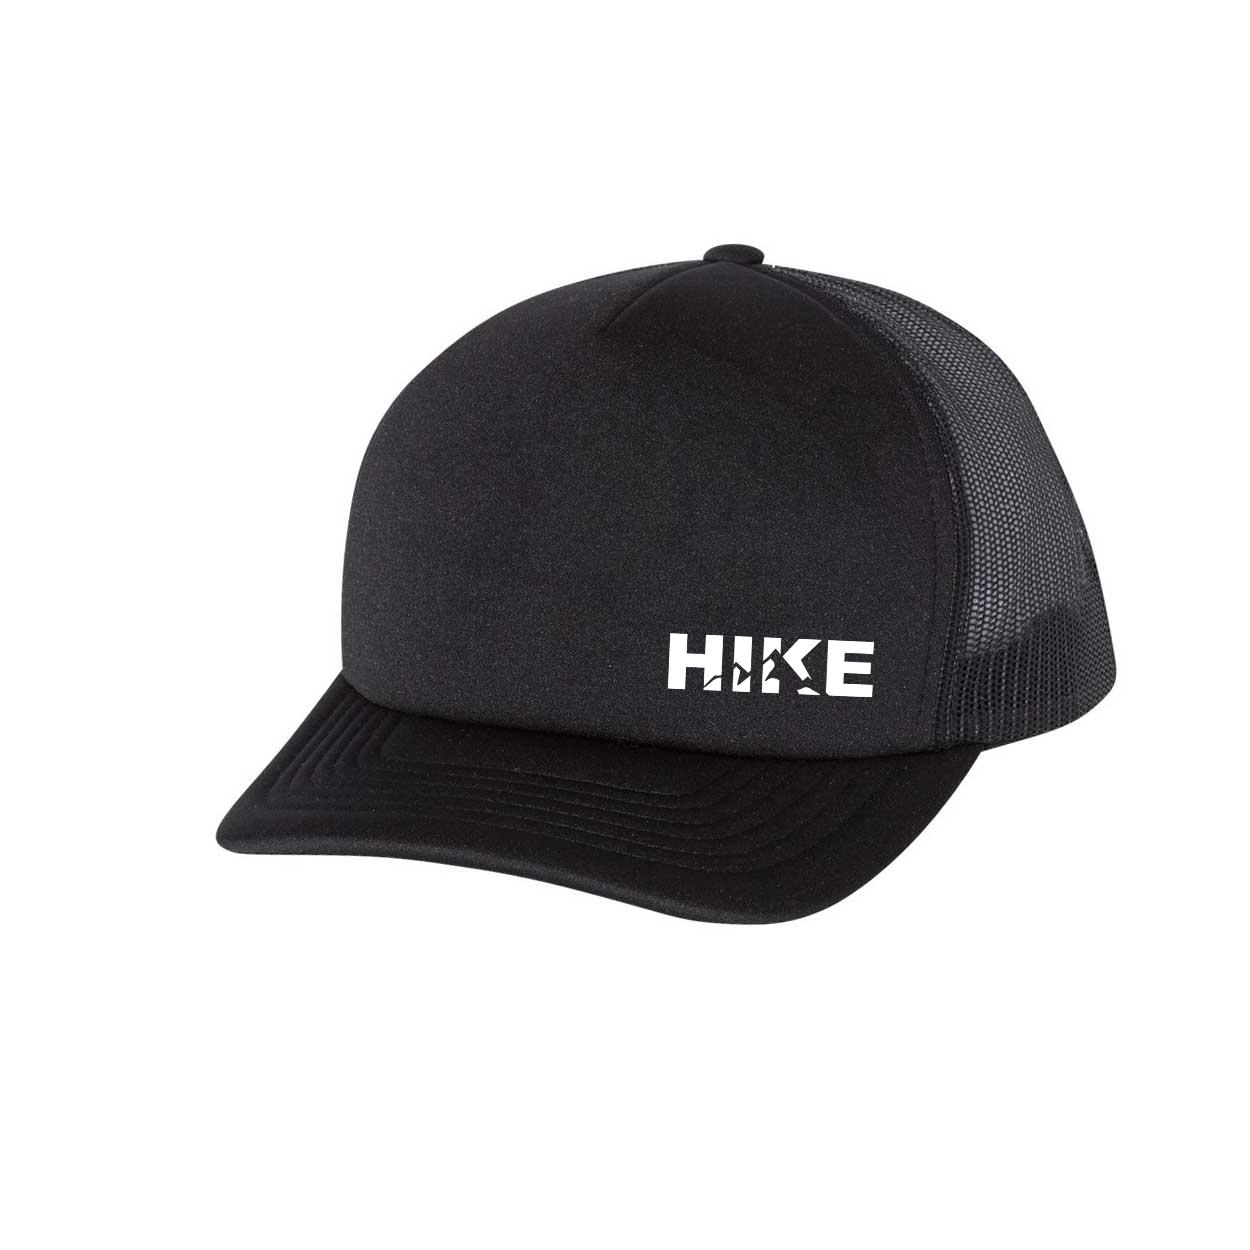 Hike Mountain Logo Night Out Premium Foam Trucker Snapback Hat Black (White Logo)